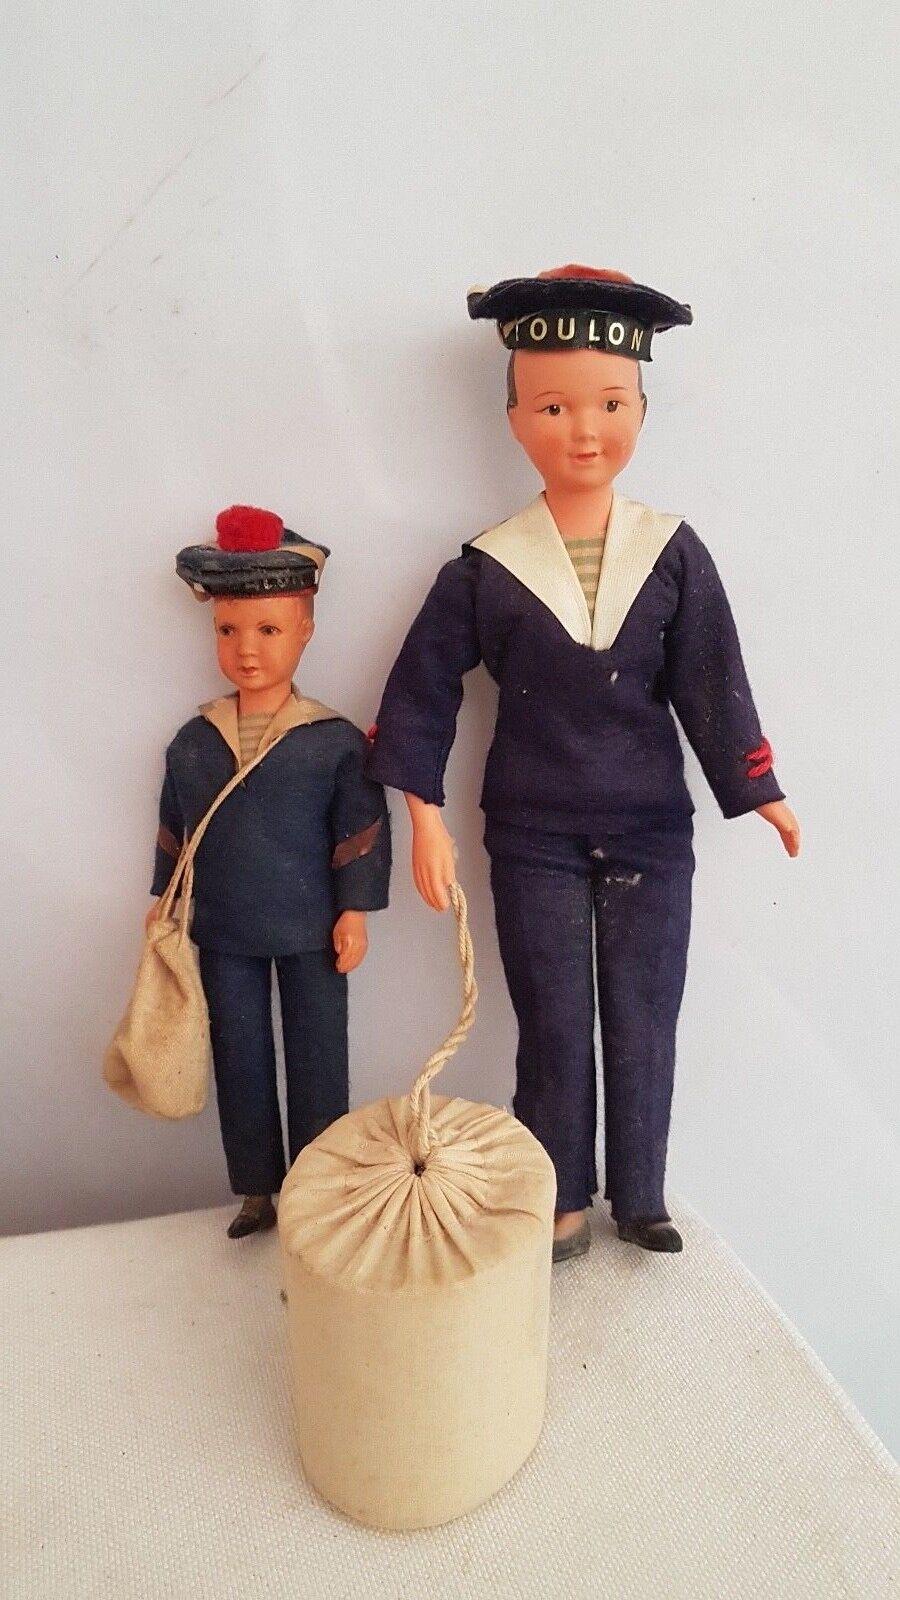 2 Anciennes Poupées  marine marins TOULON  miglior reputazione